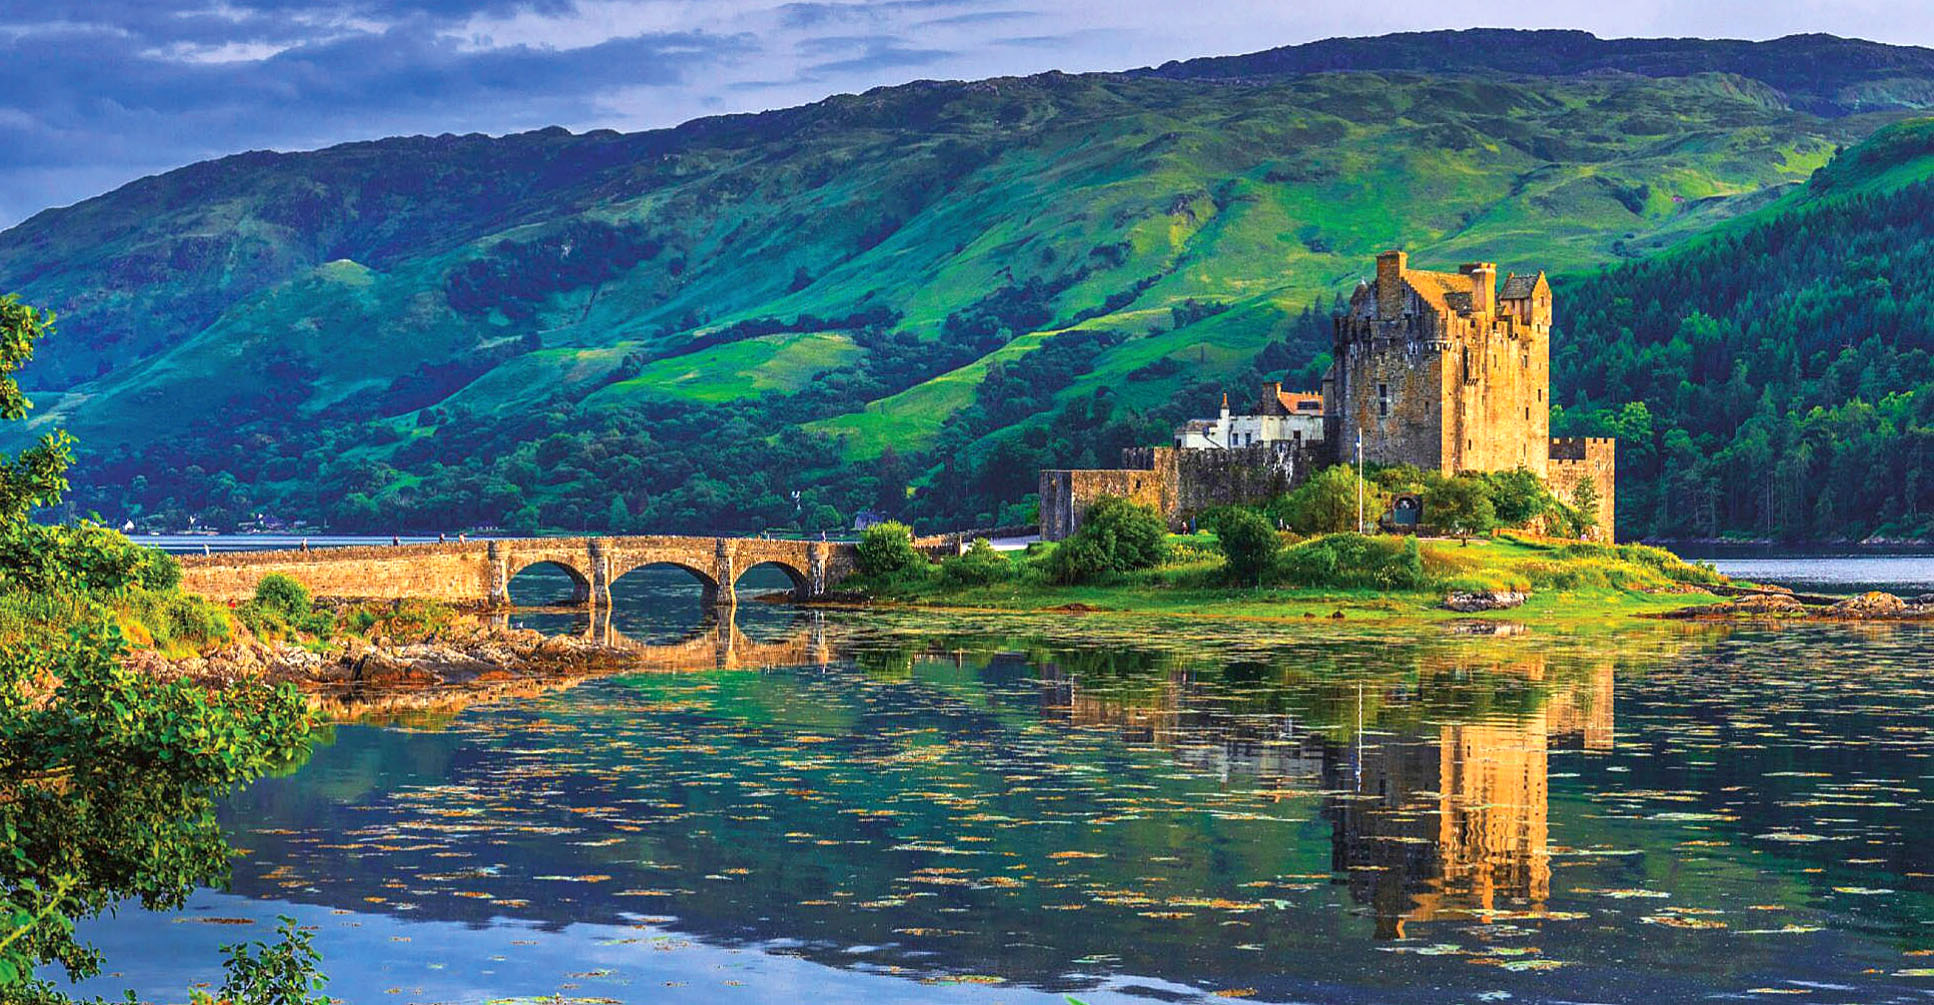 Eilean Donan Castle by Luidgi Vaccarella.jpg